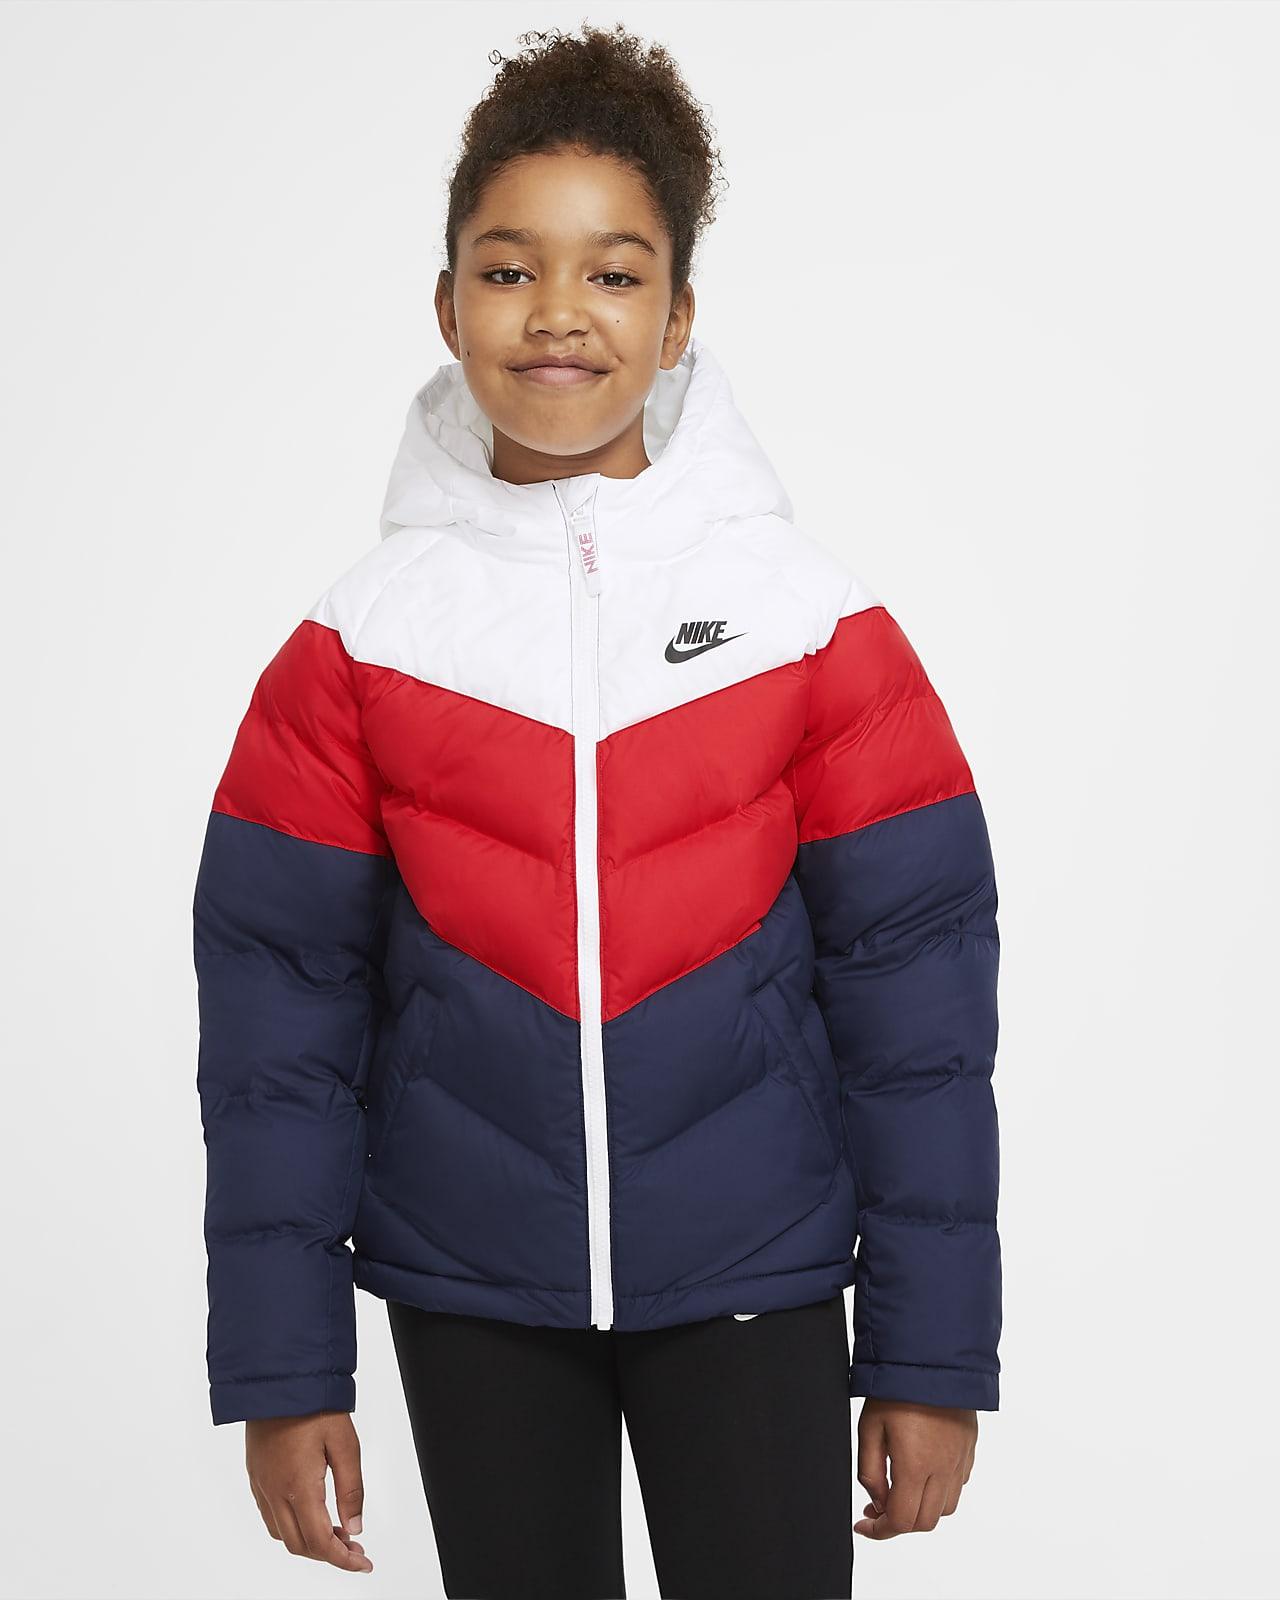 Nike Sportswear Chaqueta con relleno sintético - Niño/a